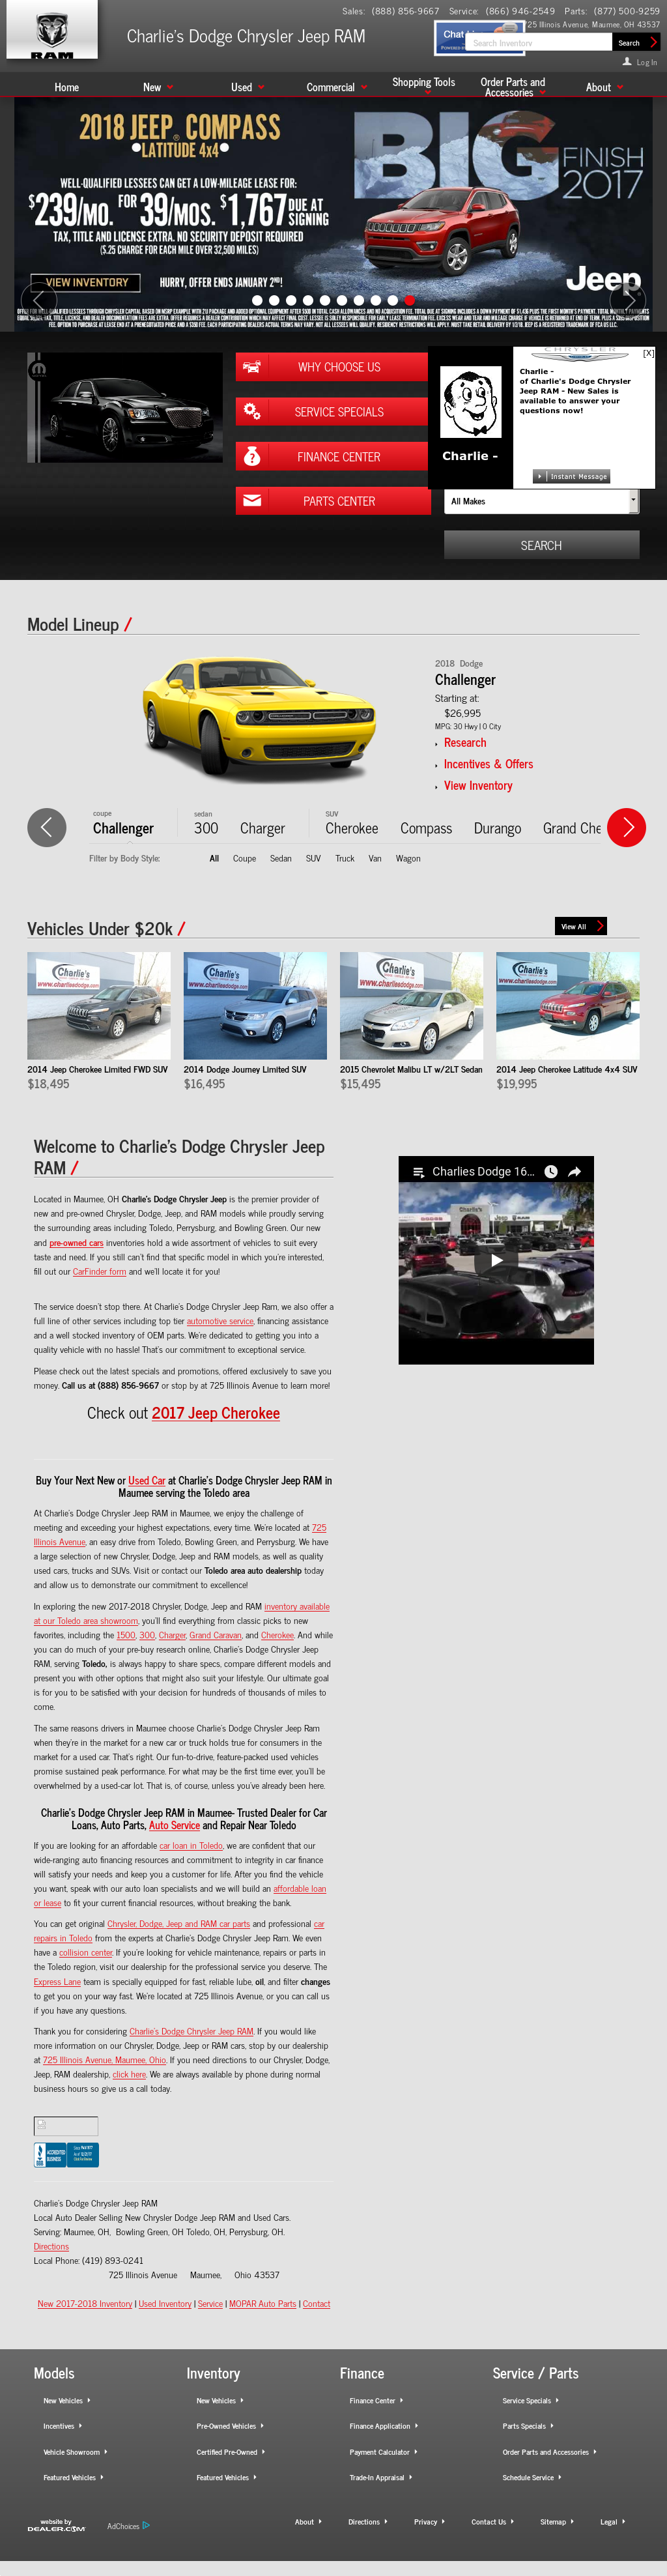 dealership kia byers dodge we chrysler new auto columbus ohio subaru about volkswagen volvo group htm jeep